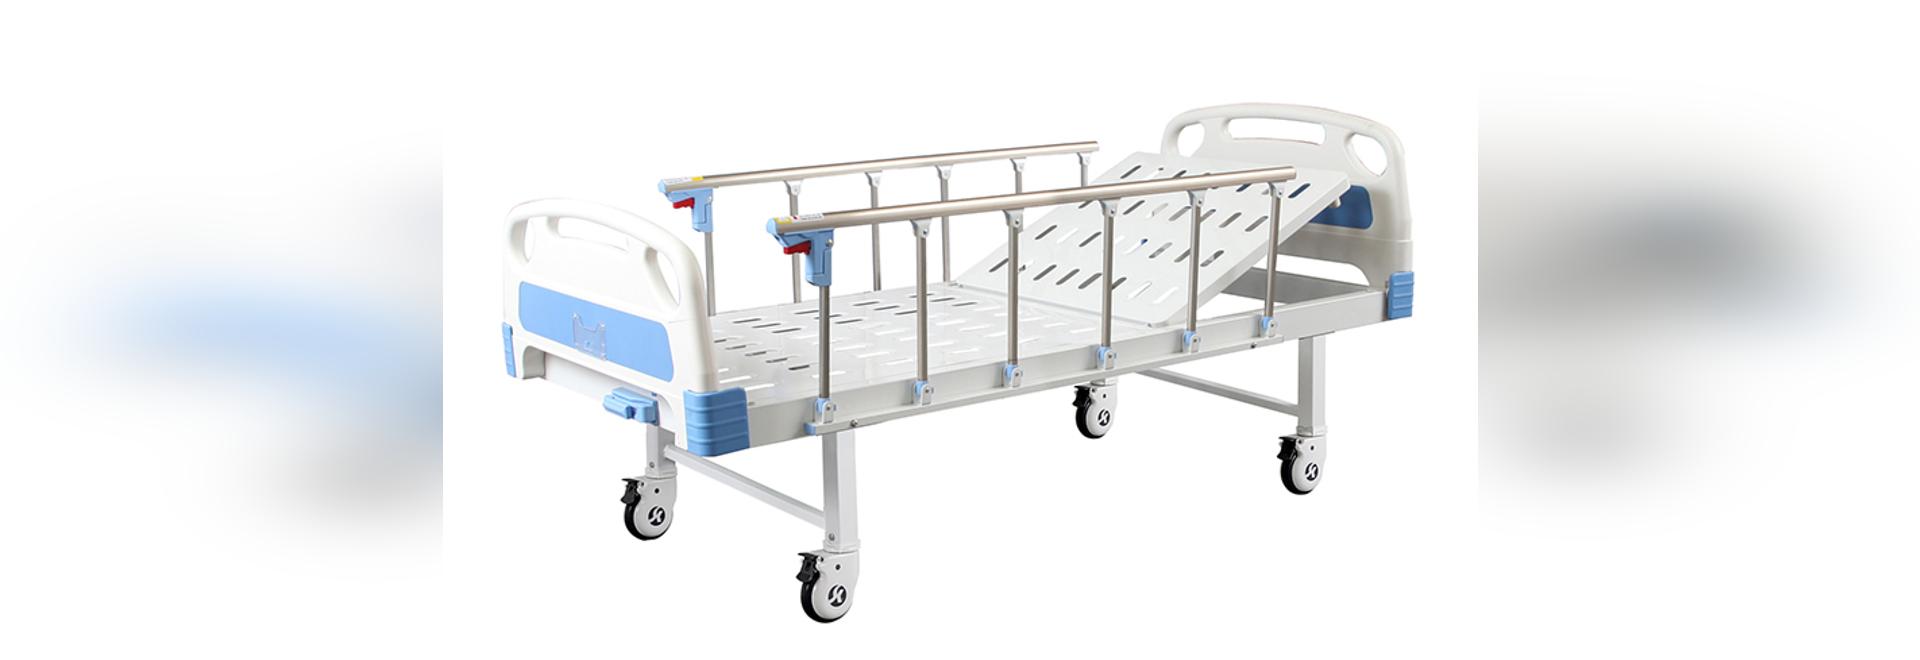 A1k Manual Hospital Bed